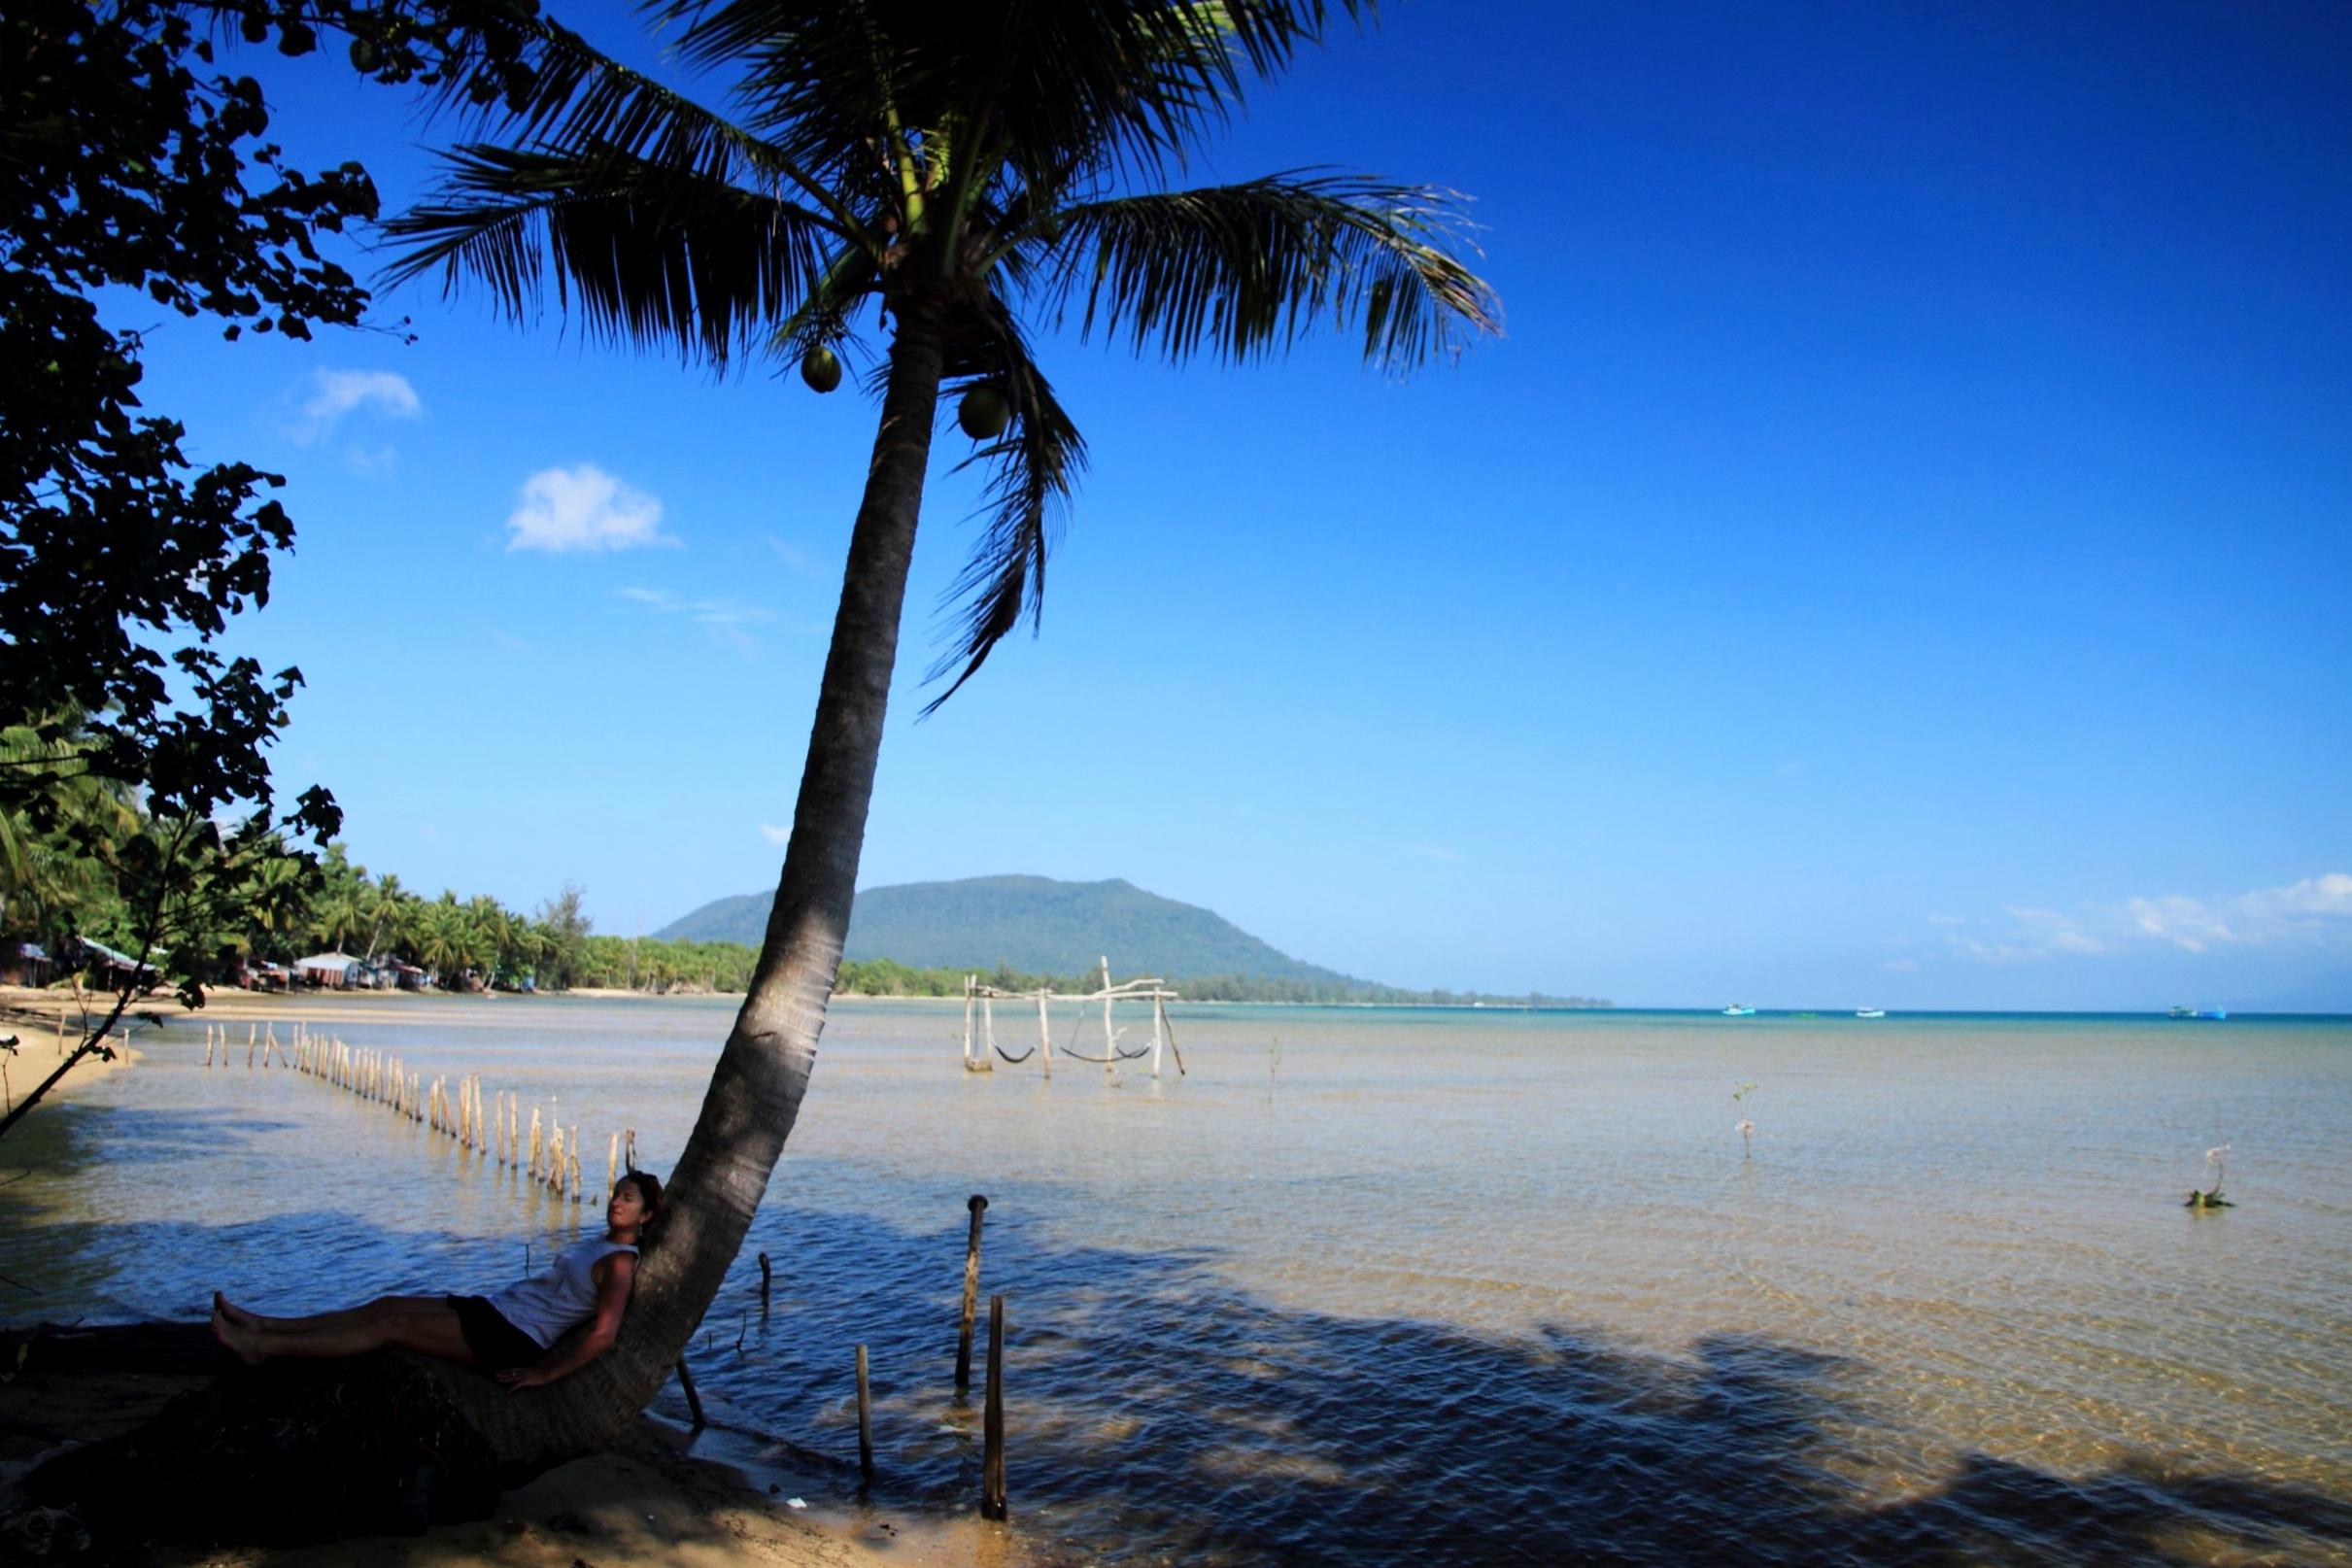 thom beach